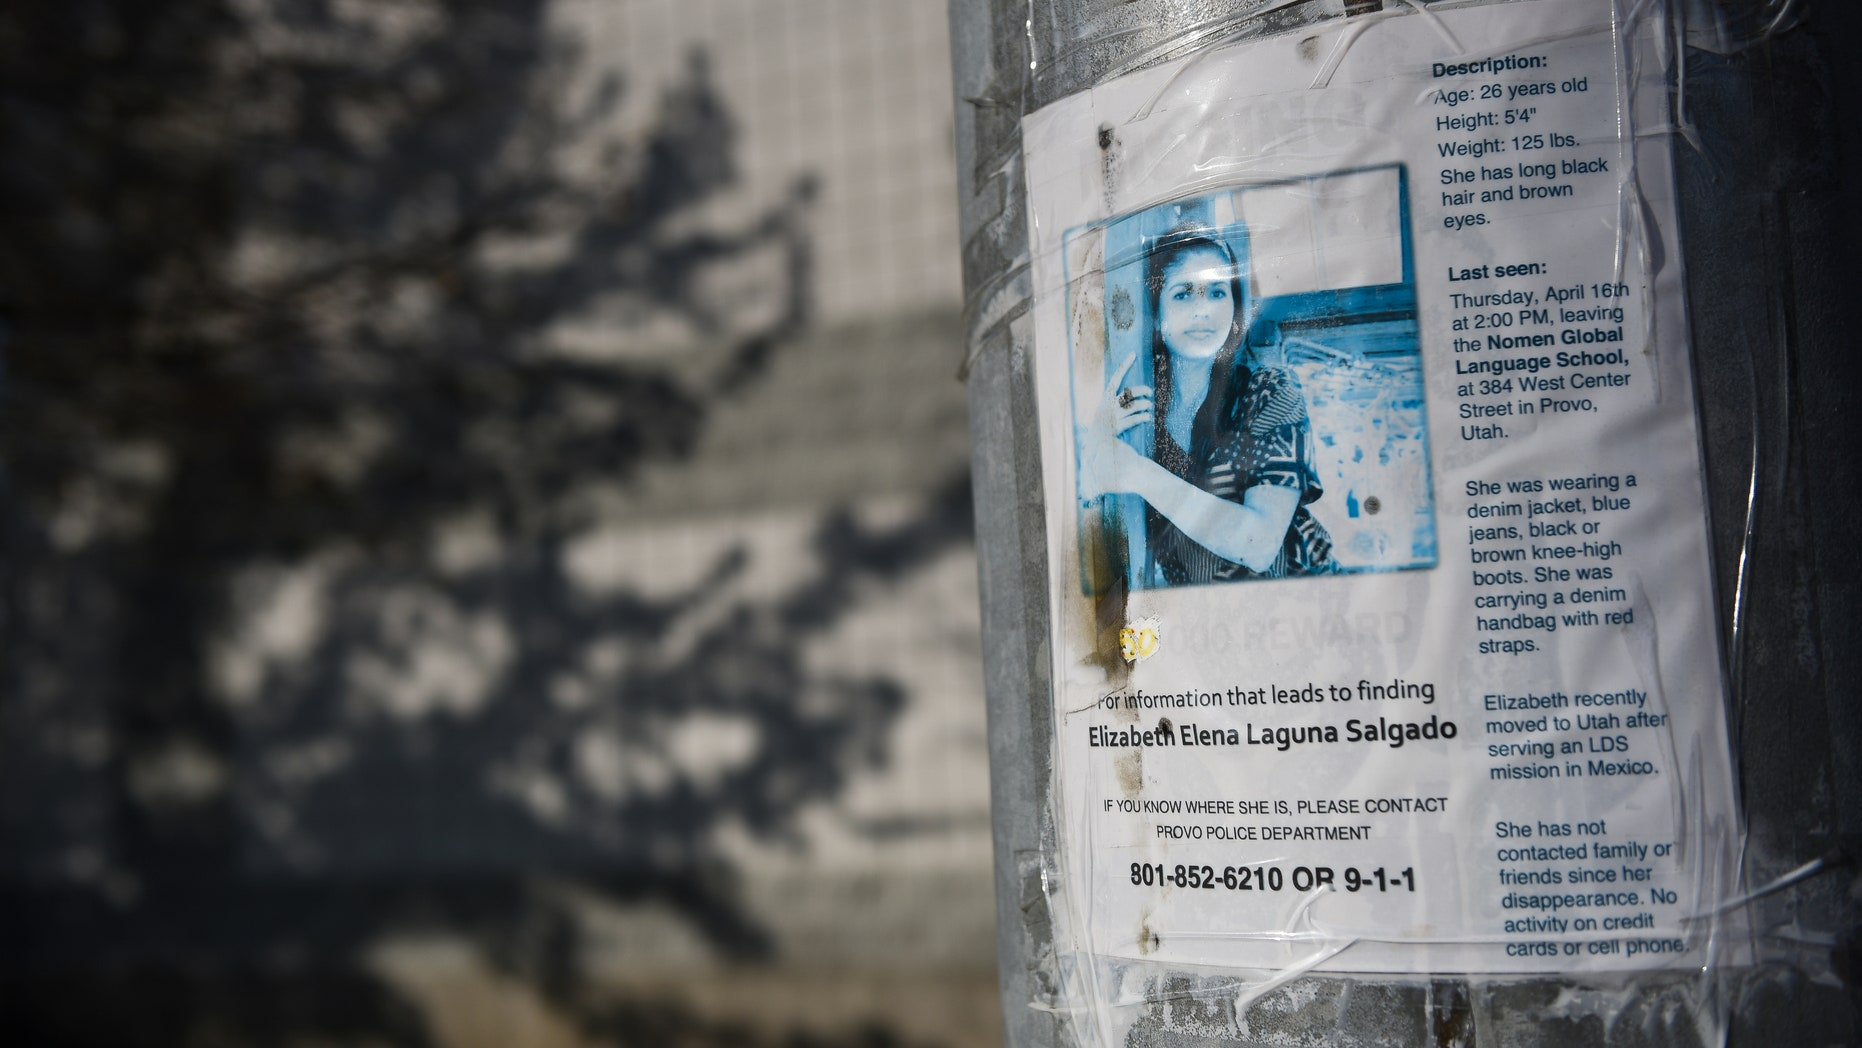 A poster seeking information about missing woman Elizabeth Elena Laguna Salgado in Provo.